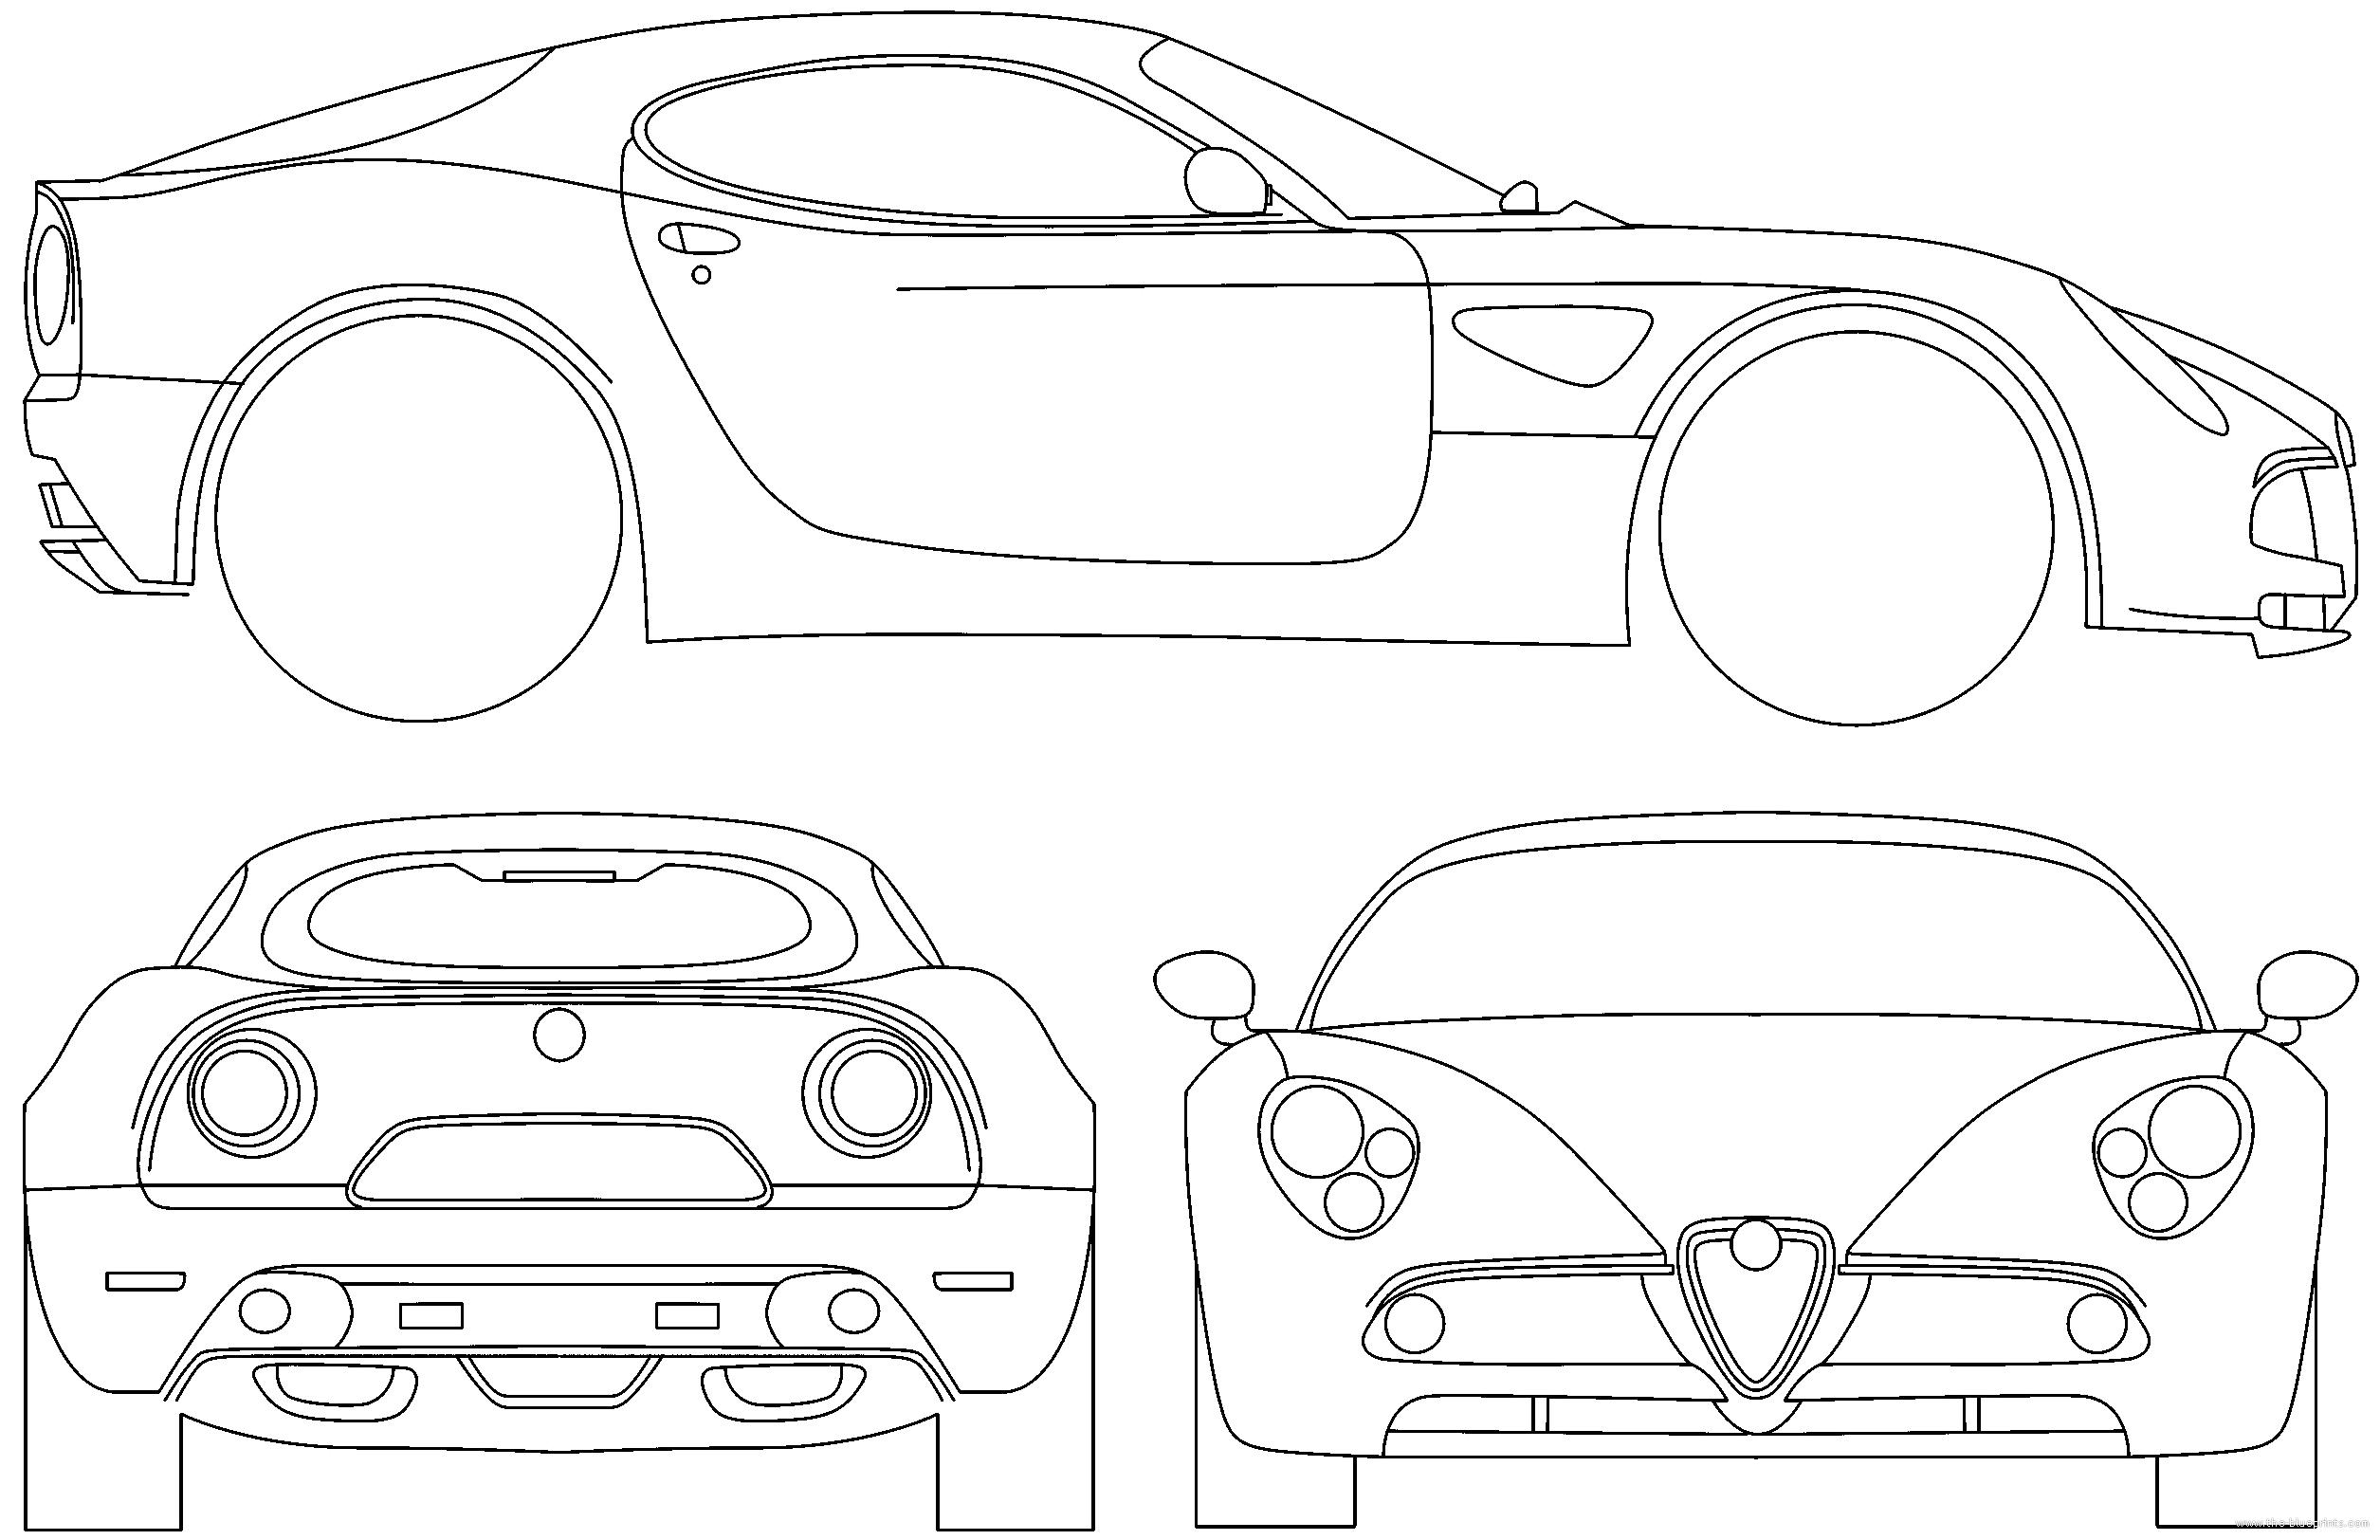 Blueprints > Cars > Alfa Romeo > Alfa Romeo 8C Competitzione (2008)